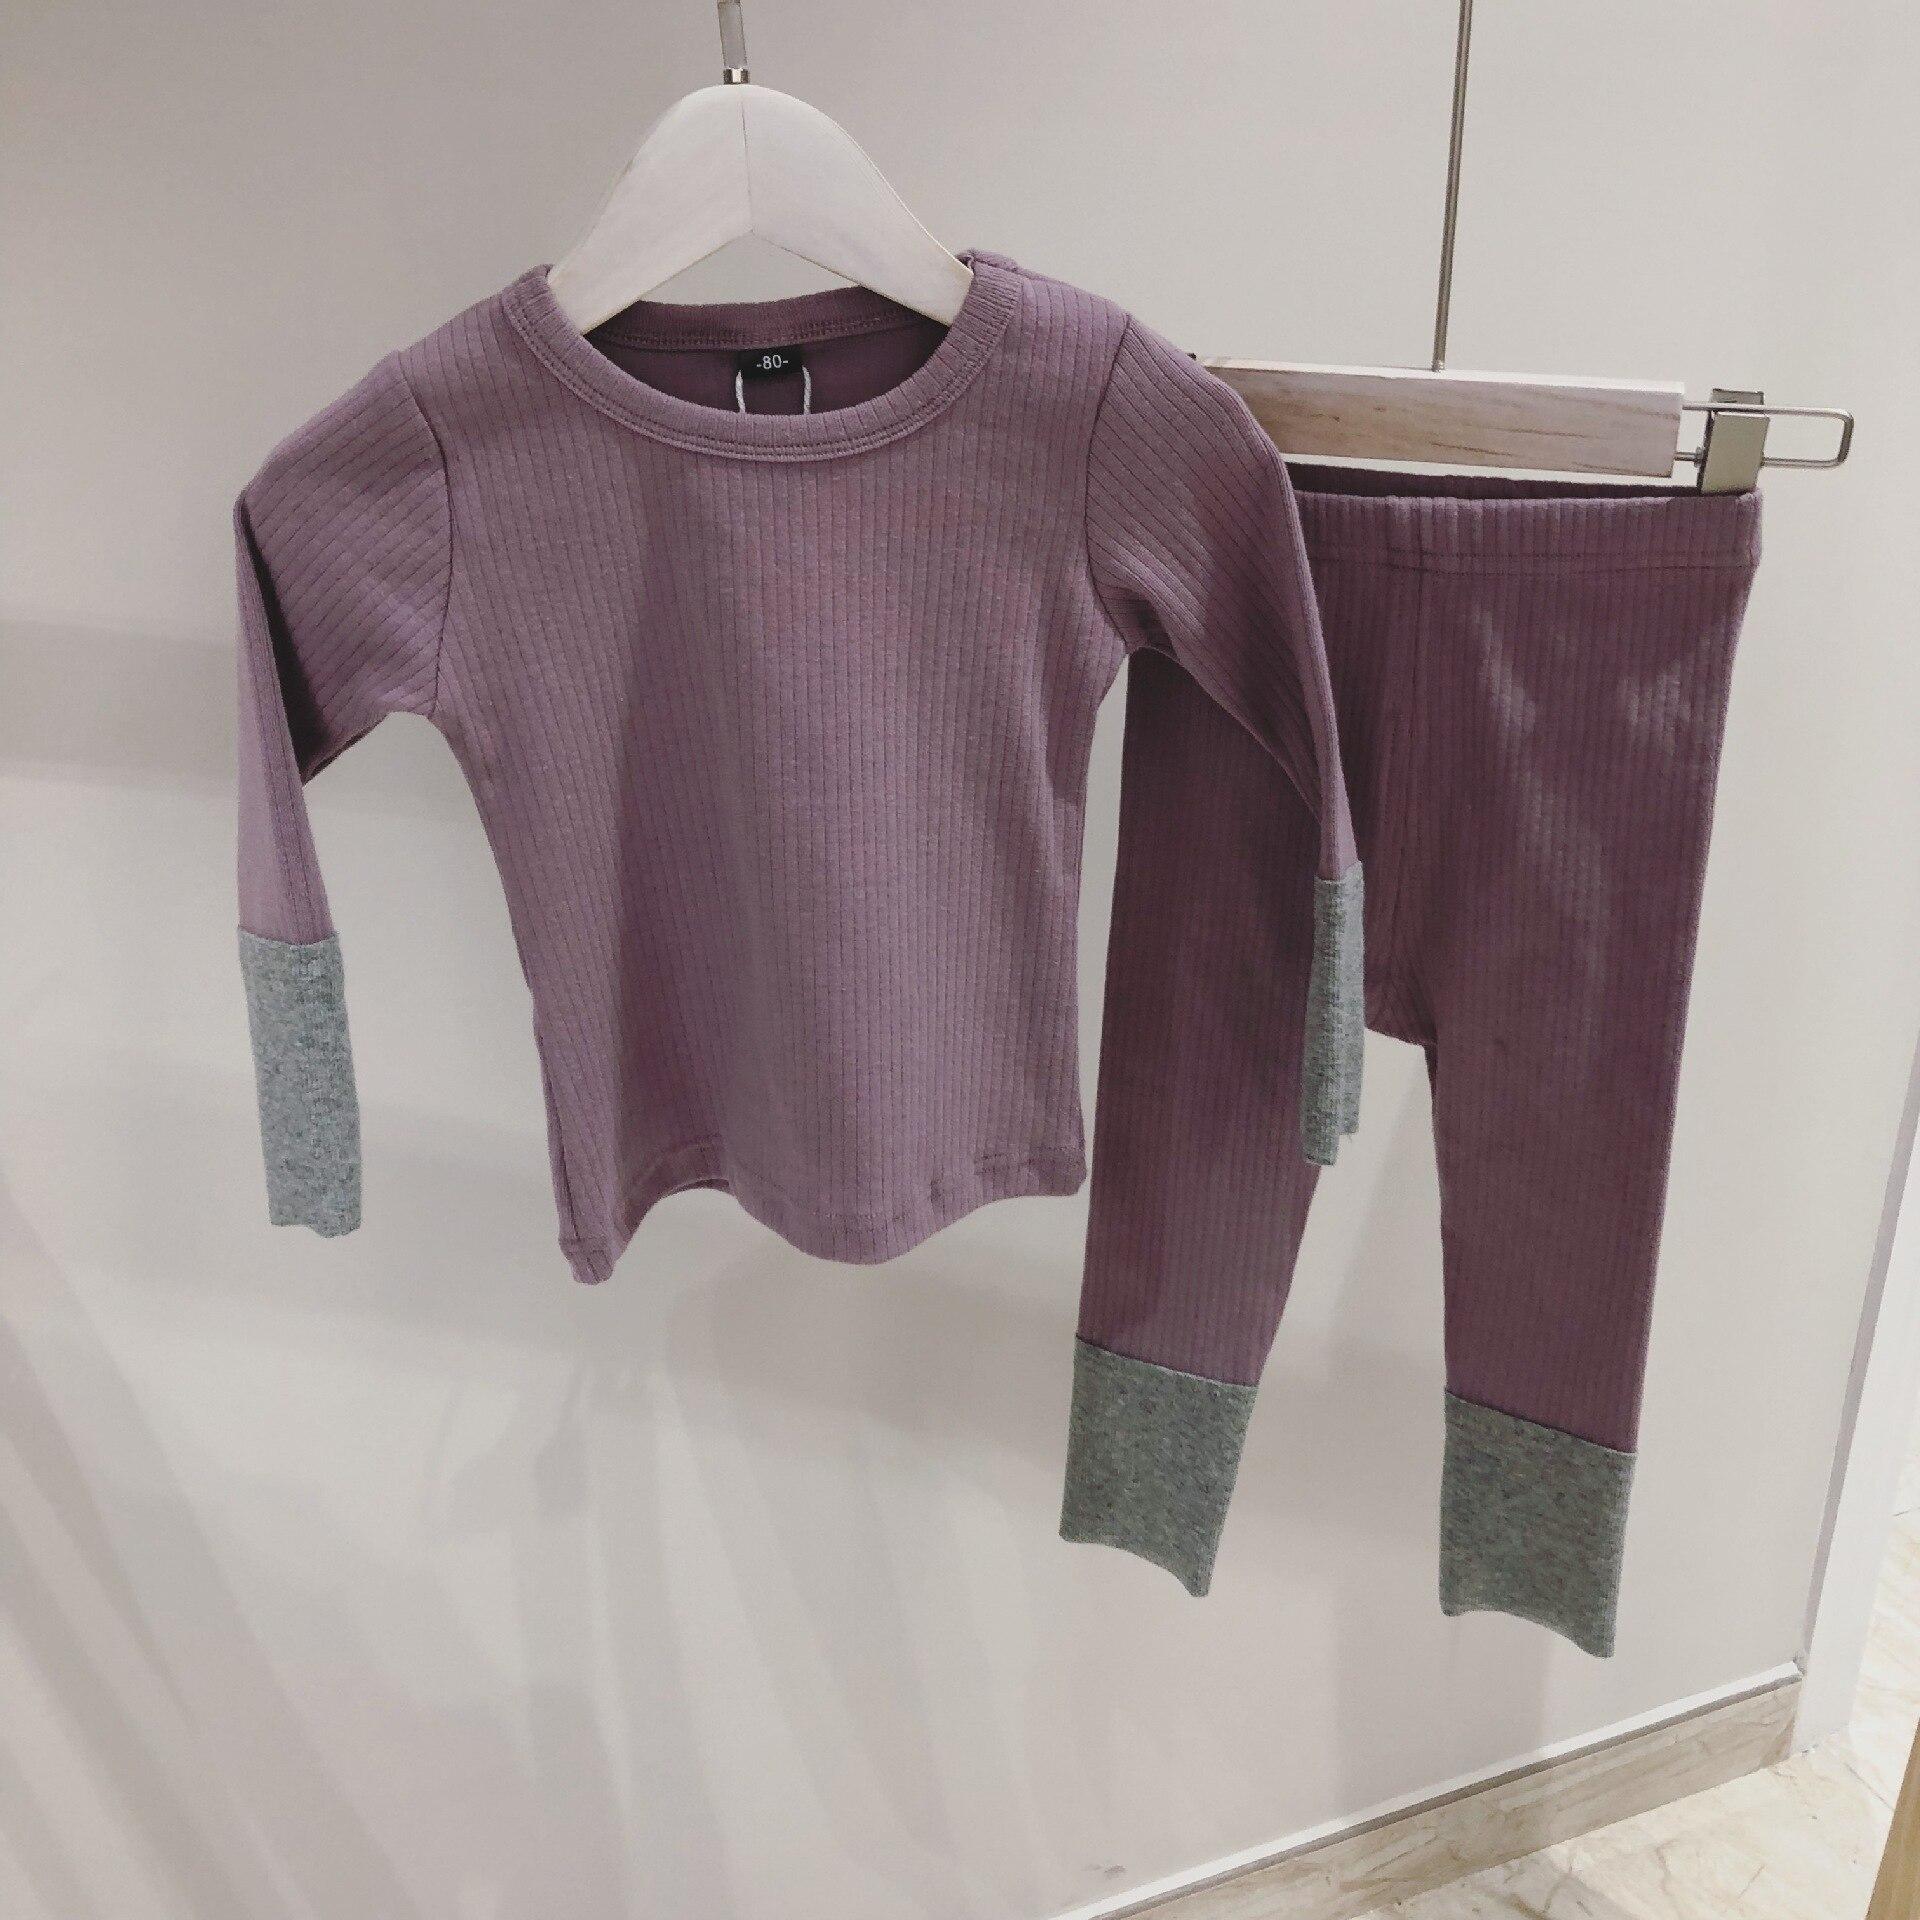 2020 Spring Kids Tracksuit Children Ribbed Pajamas Set Baby Boys Girls Cotton Homewear T-shirt + Pants Sets Toddler Girl Clothes